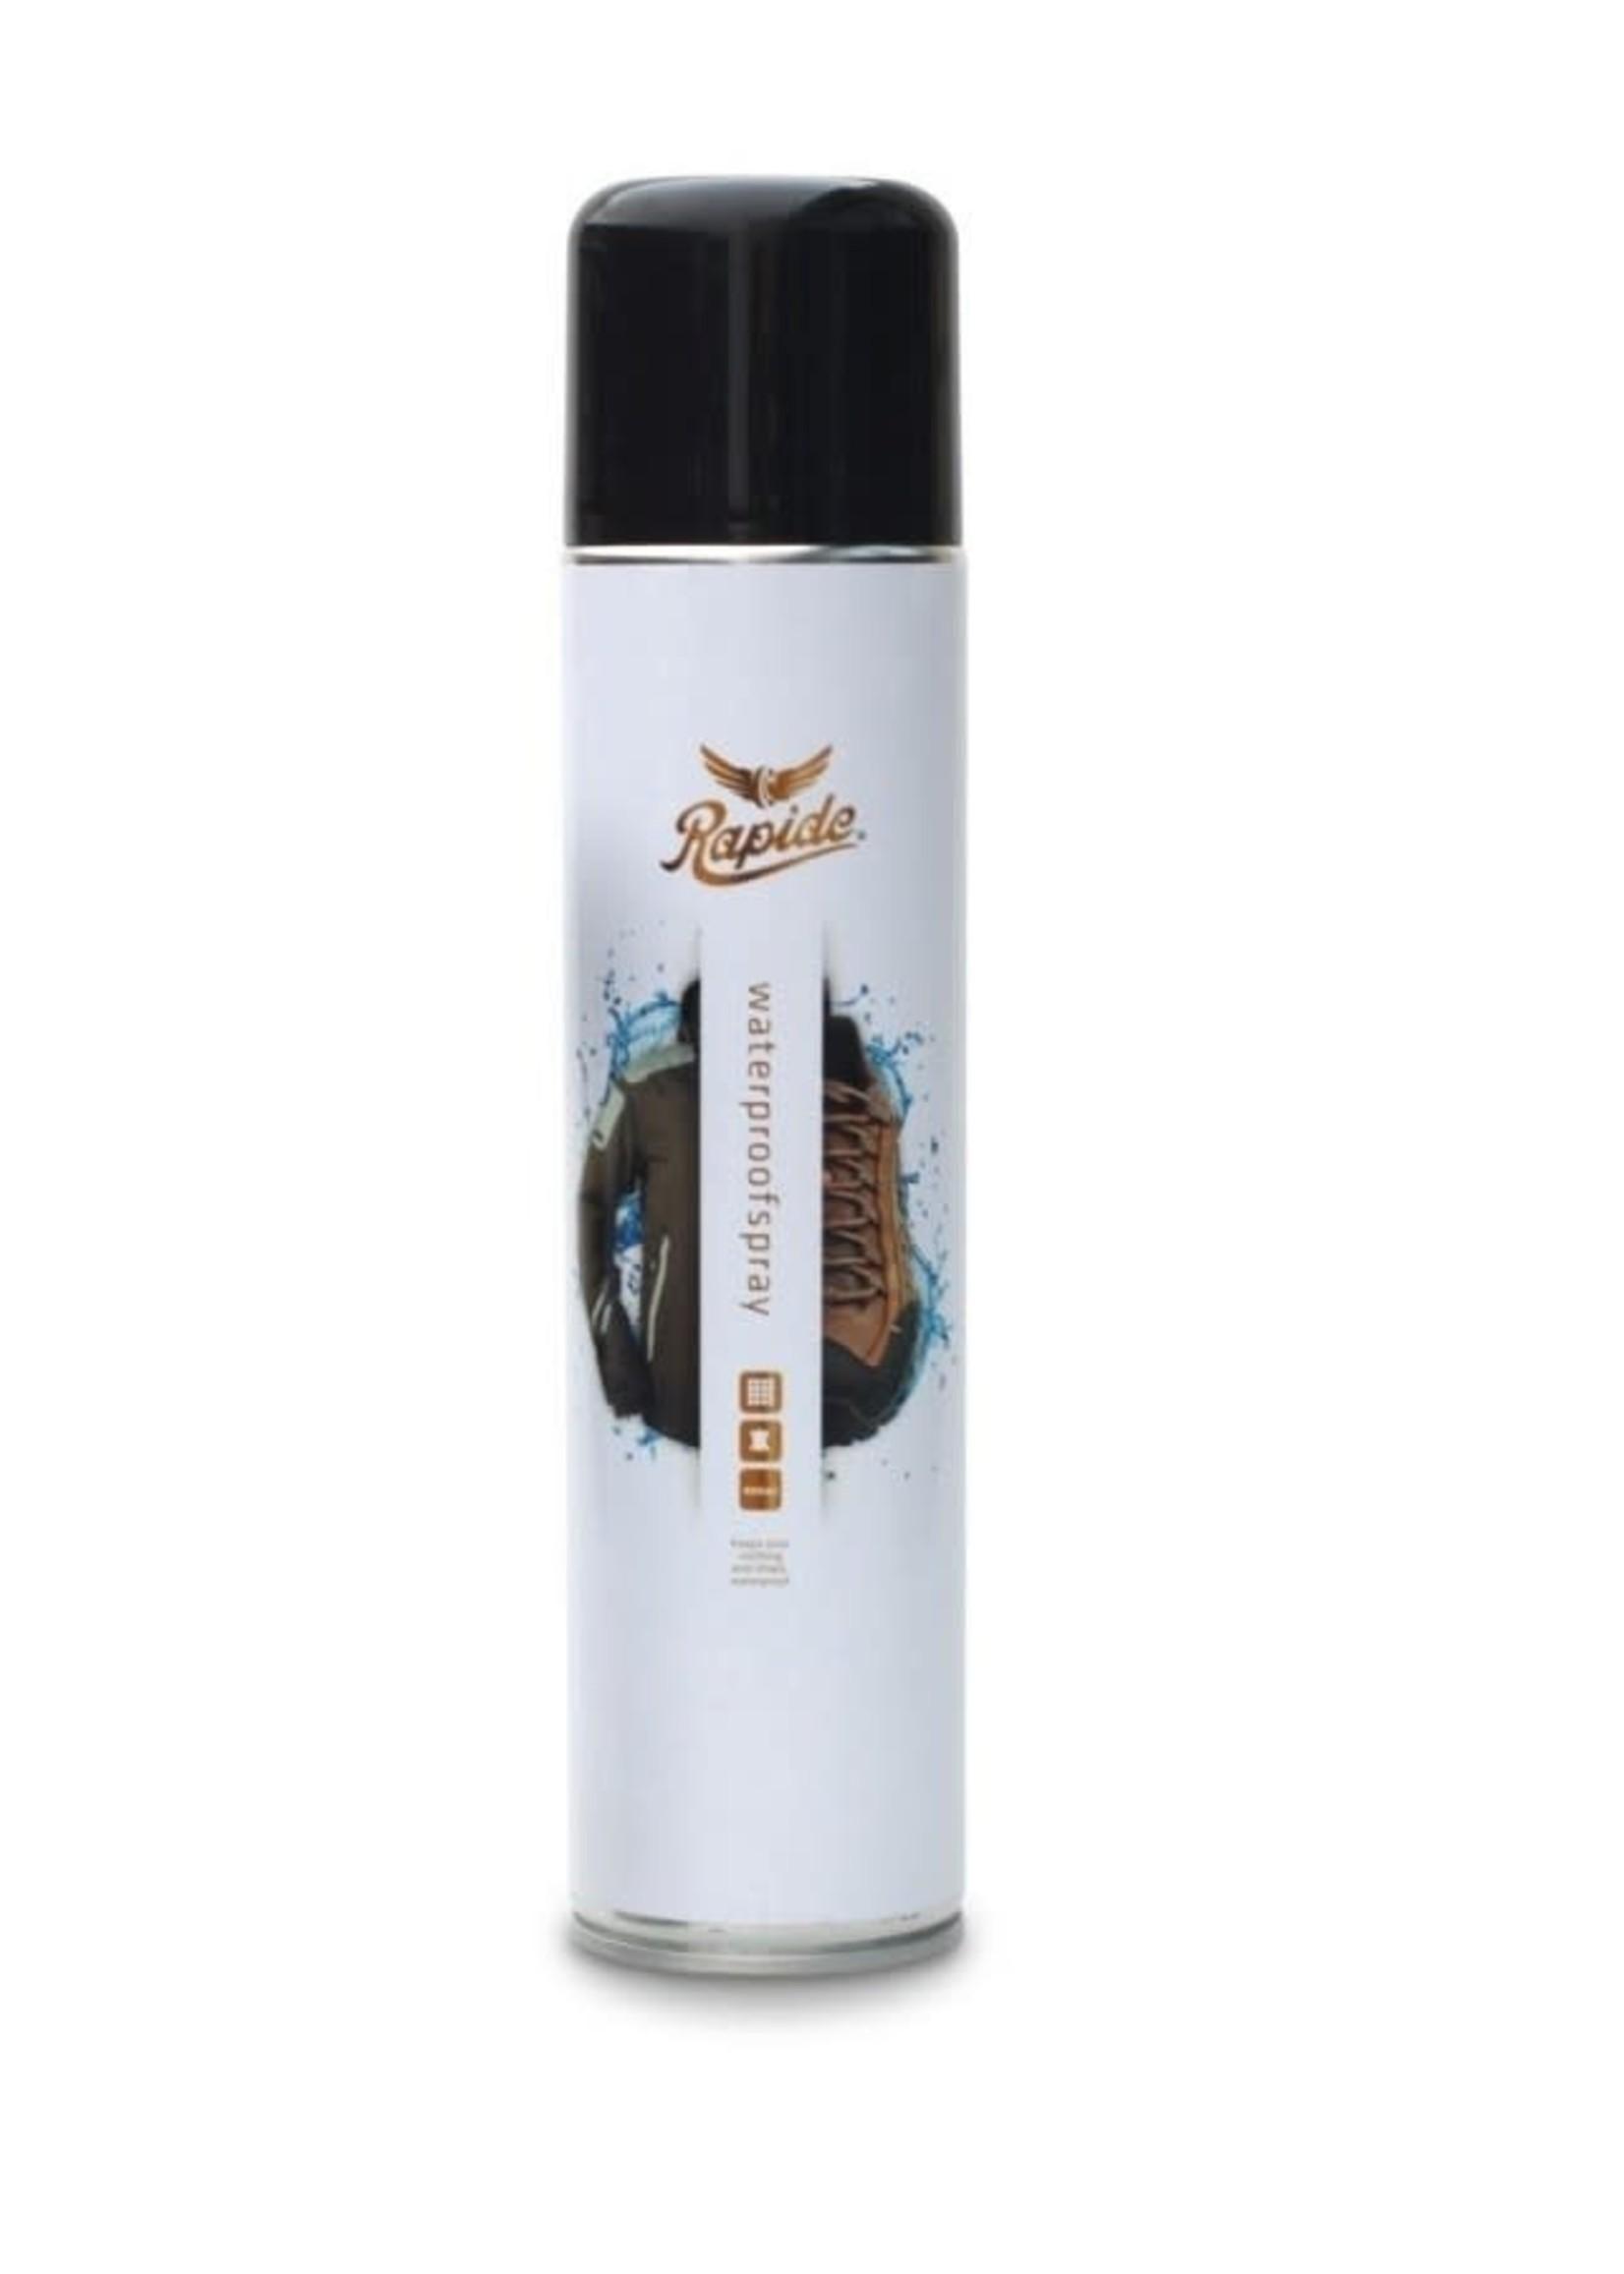 Grand Canyon Bikewear Rapid waterproof spray 400ml